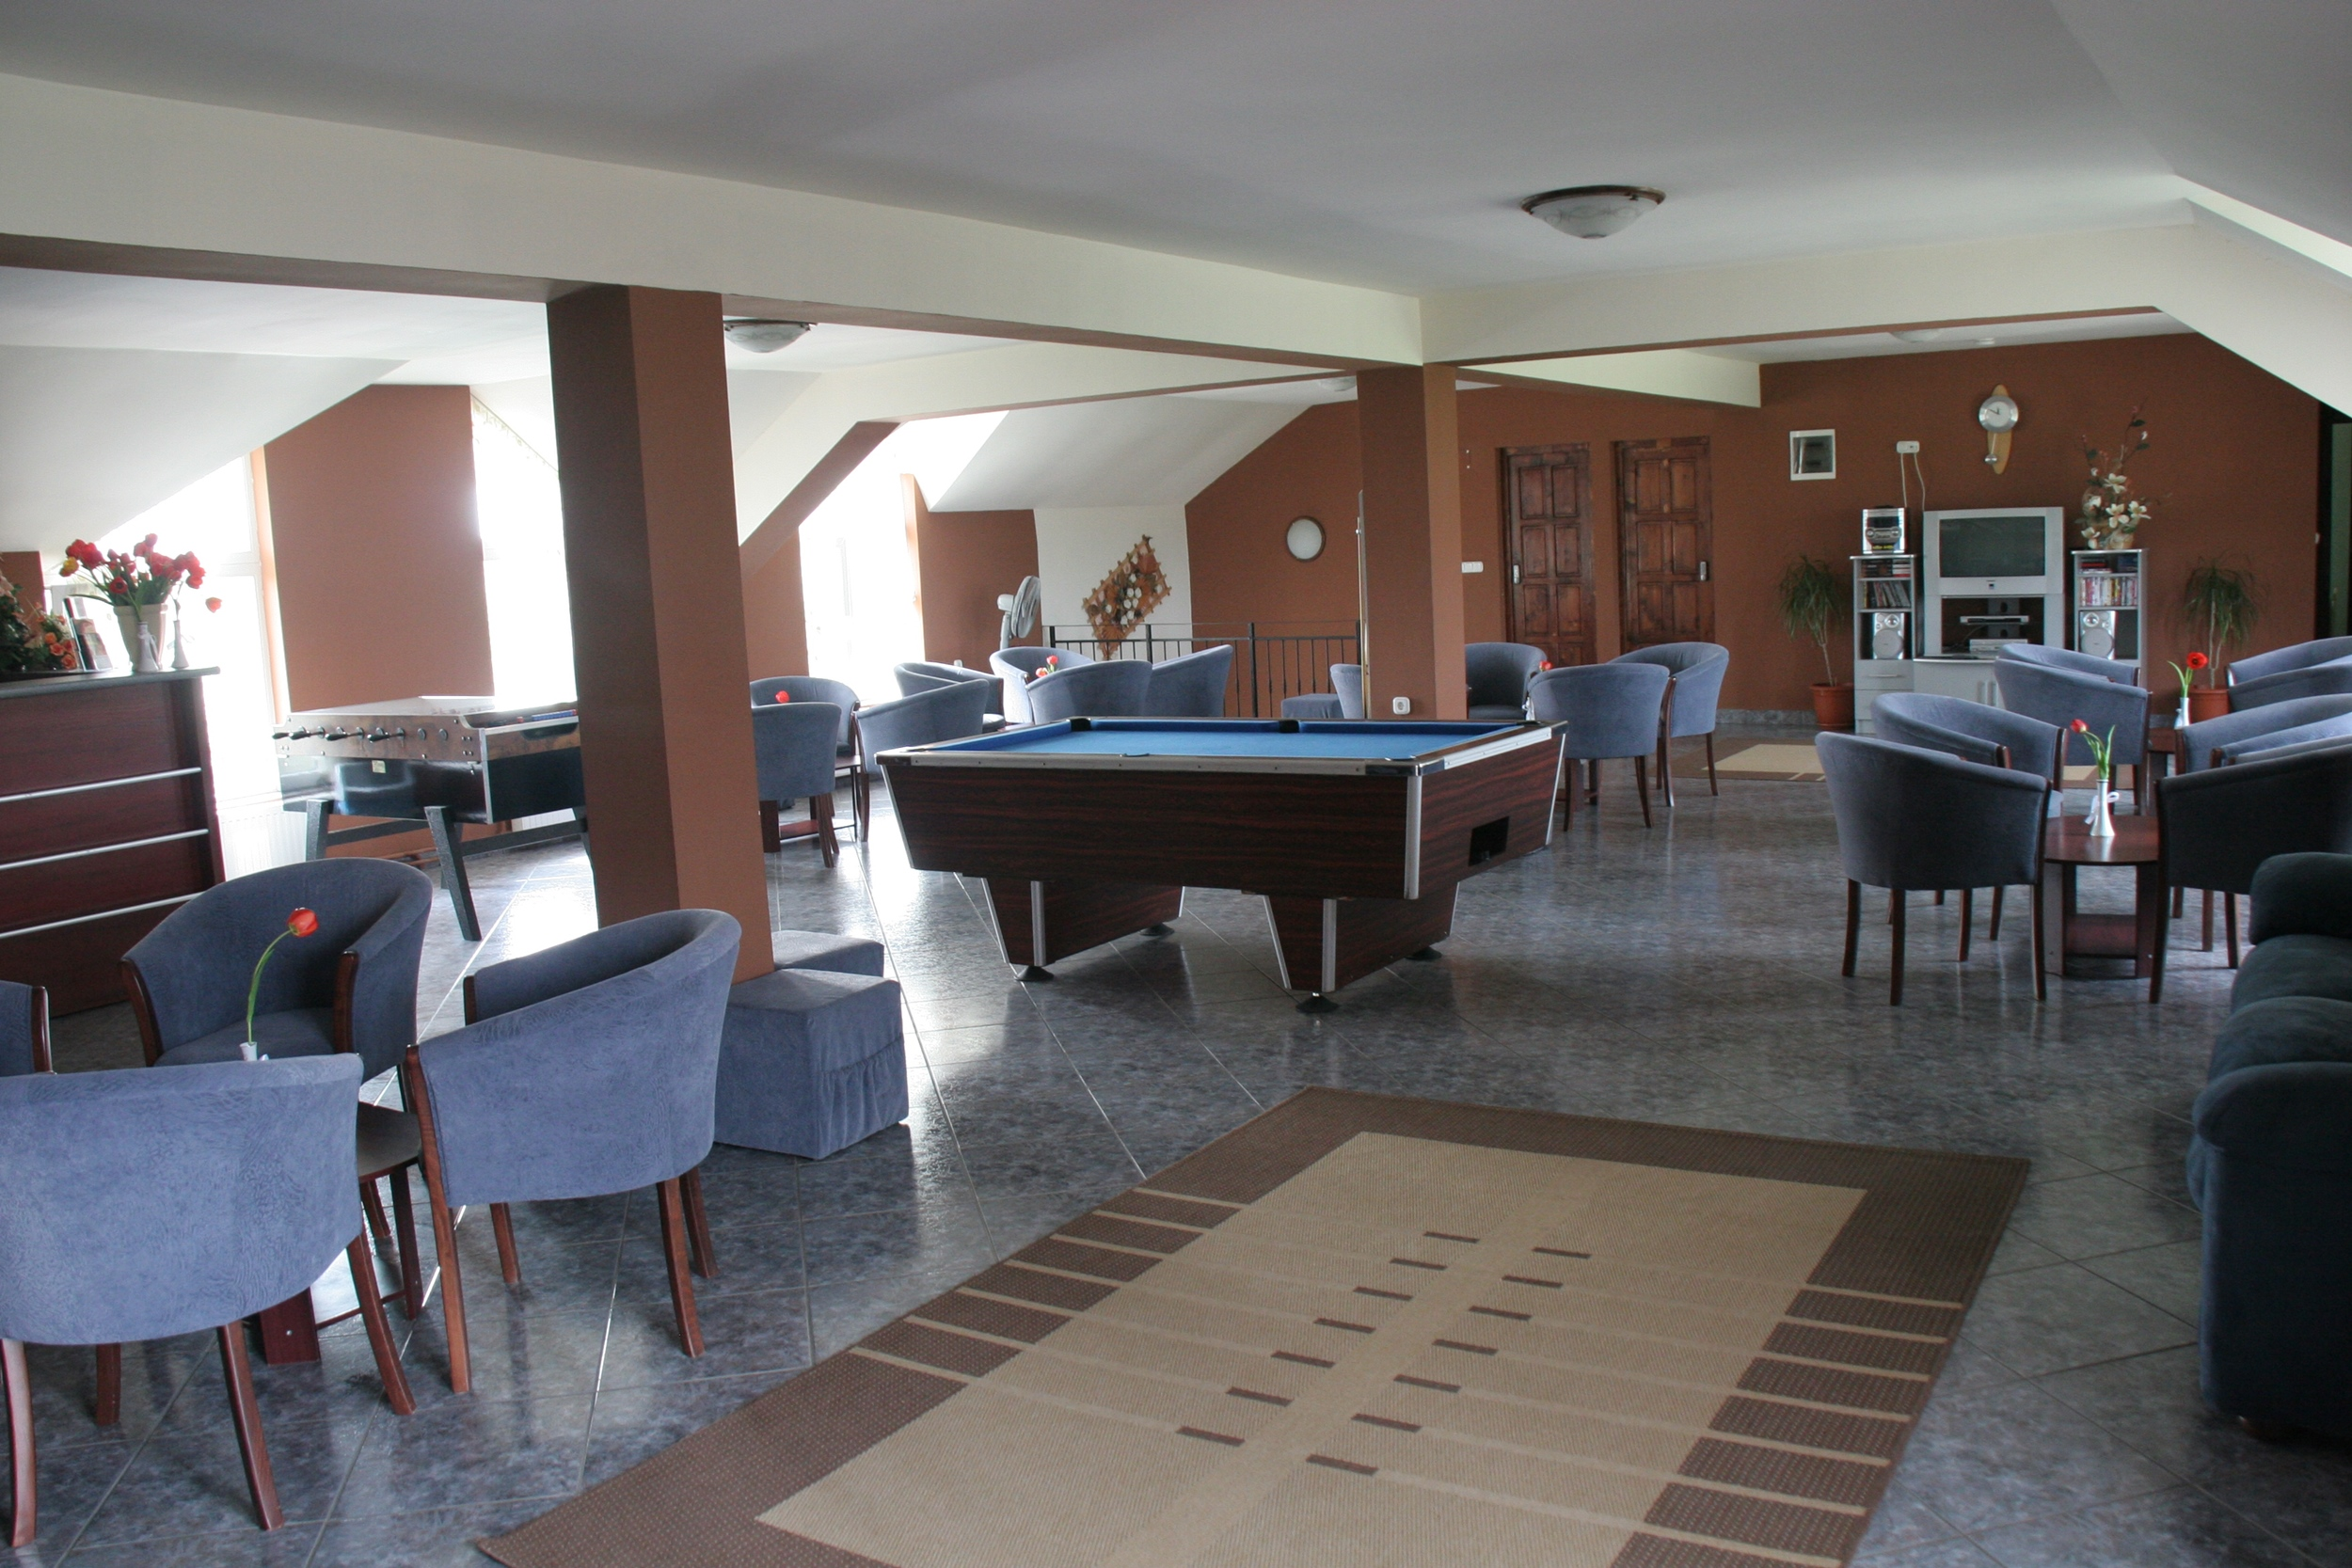 Mission Centre Recreation Room